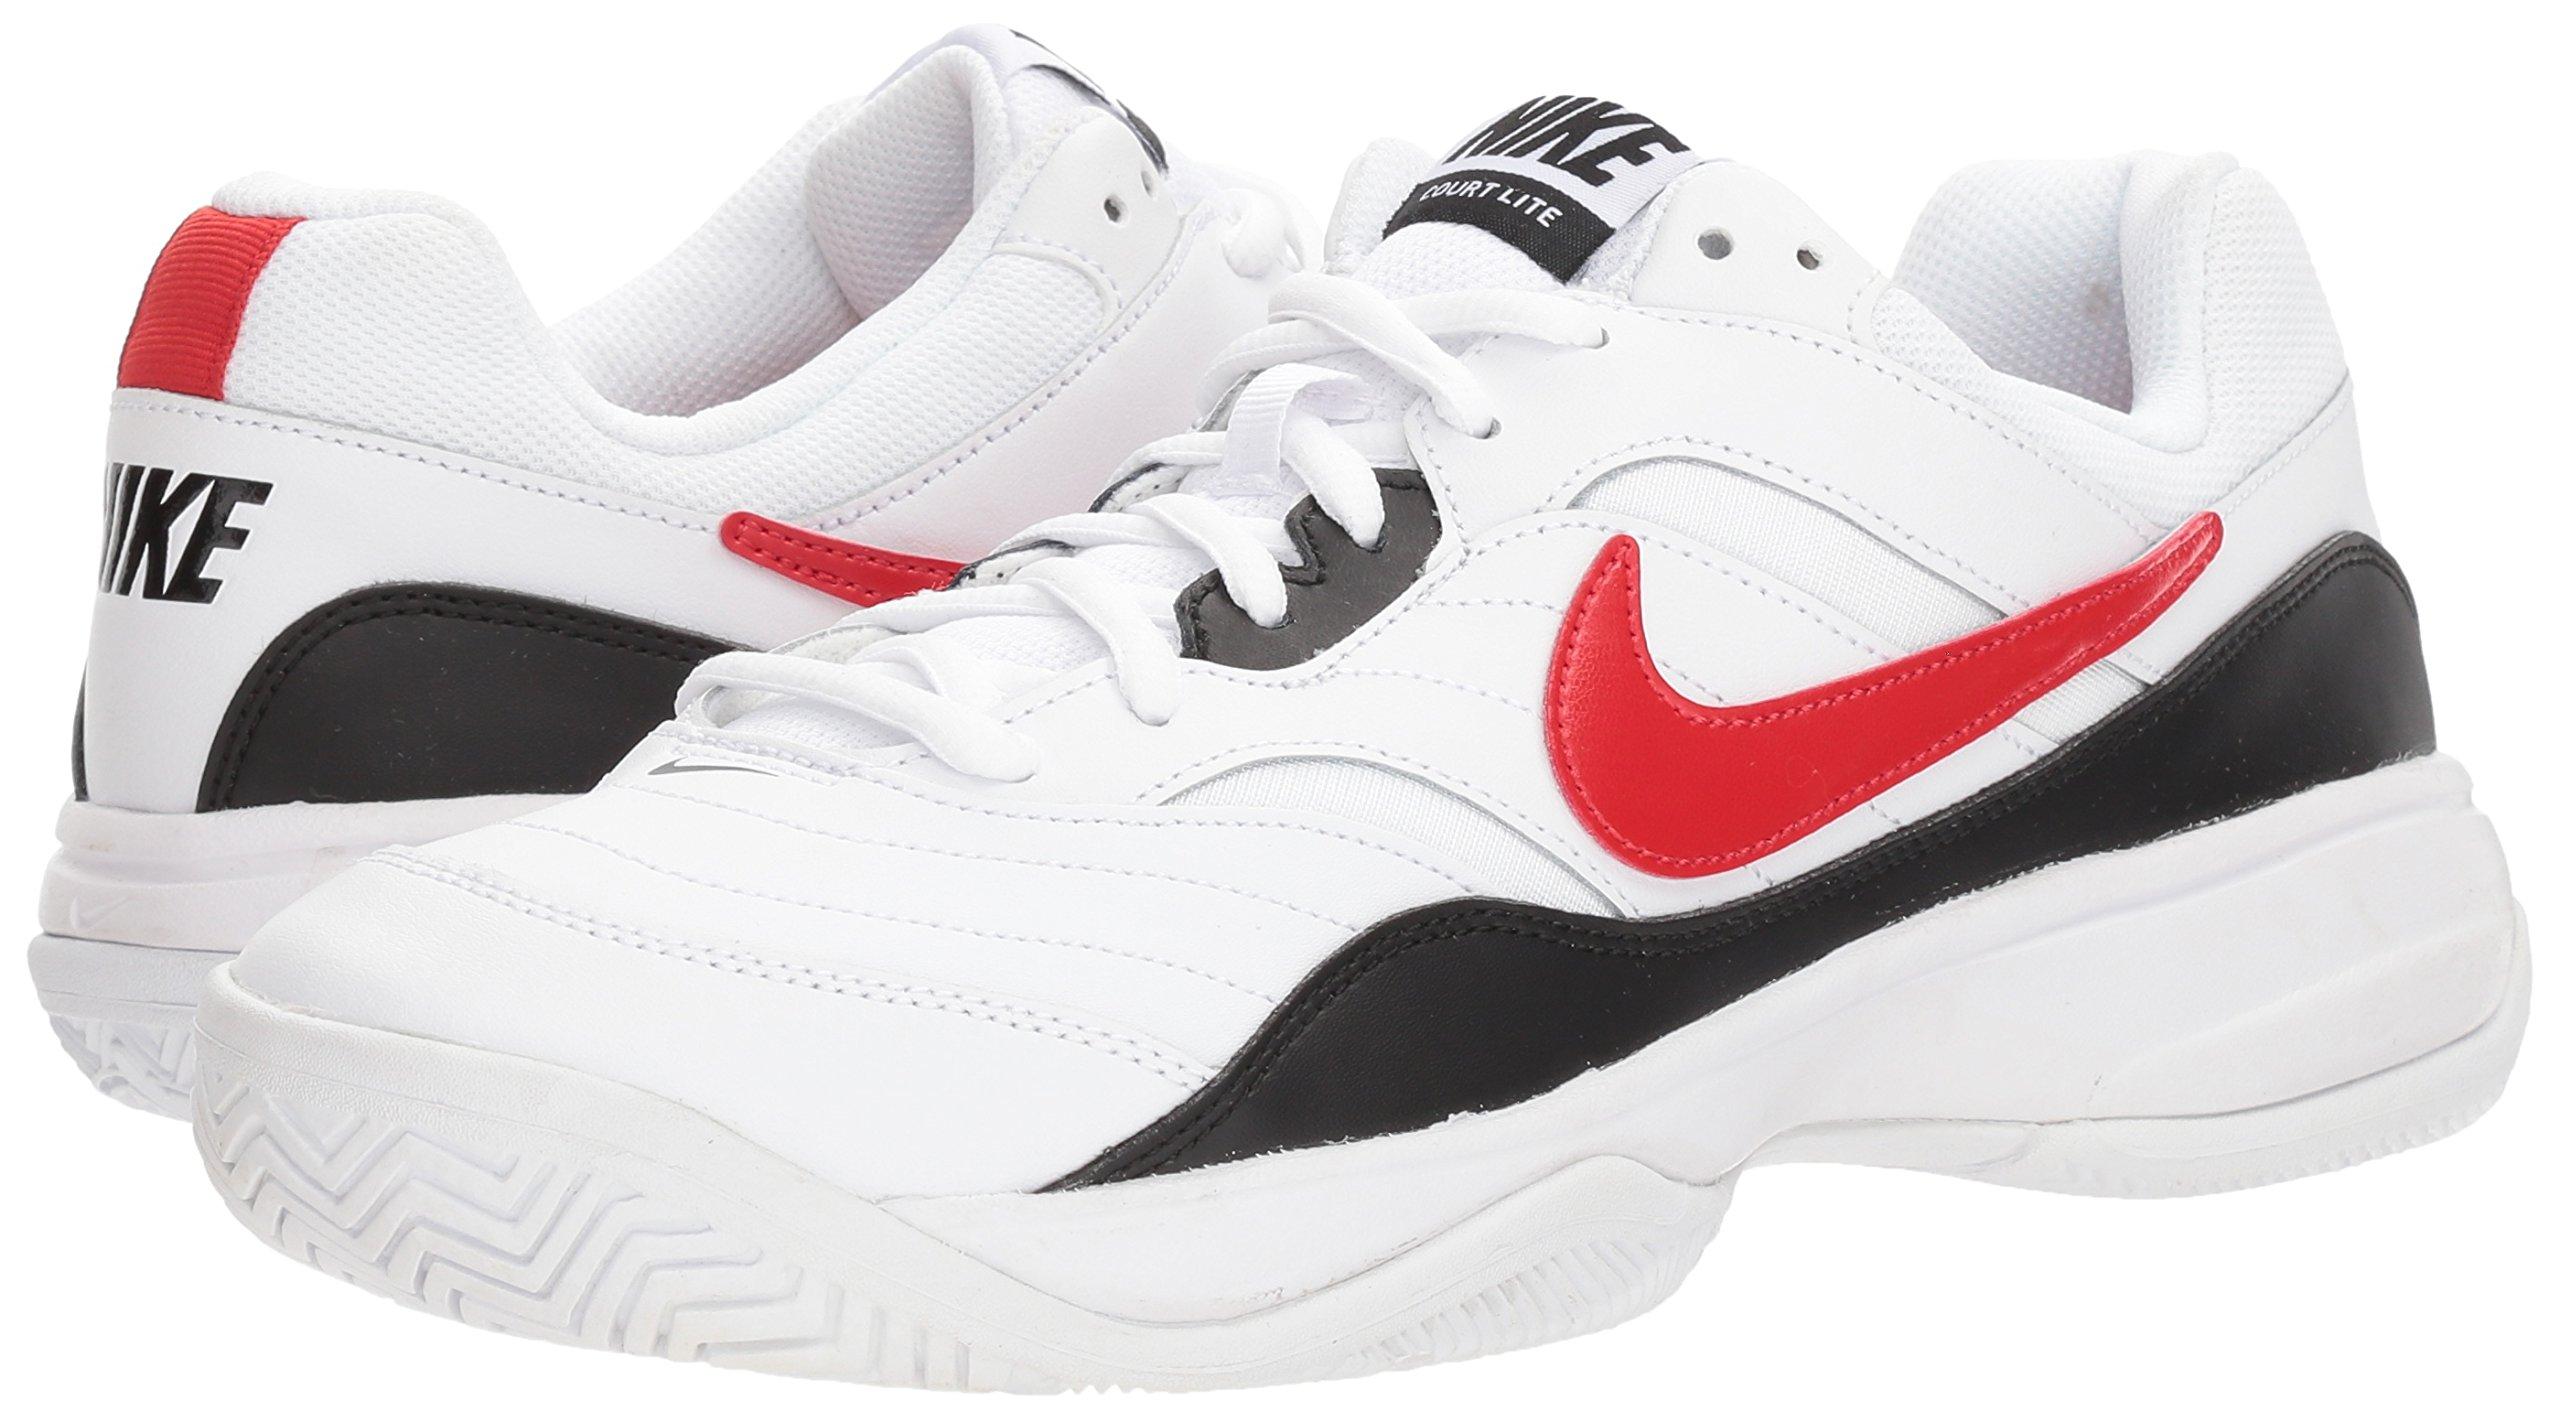 Nike Men's Court Lite Tennis Shoe, White/University red/Black, 7.5 D US by Nike (Image #6)